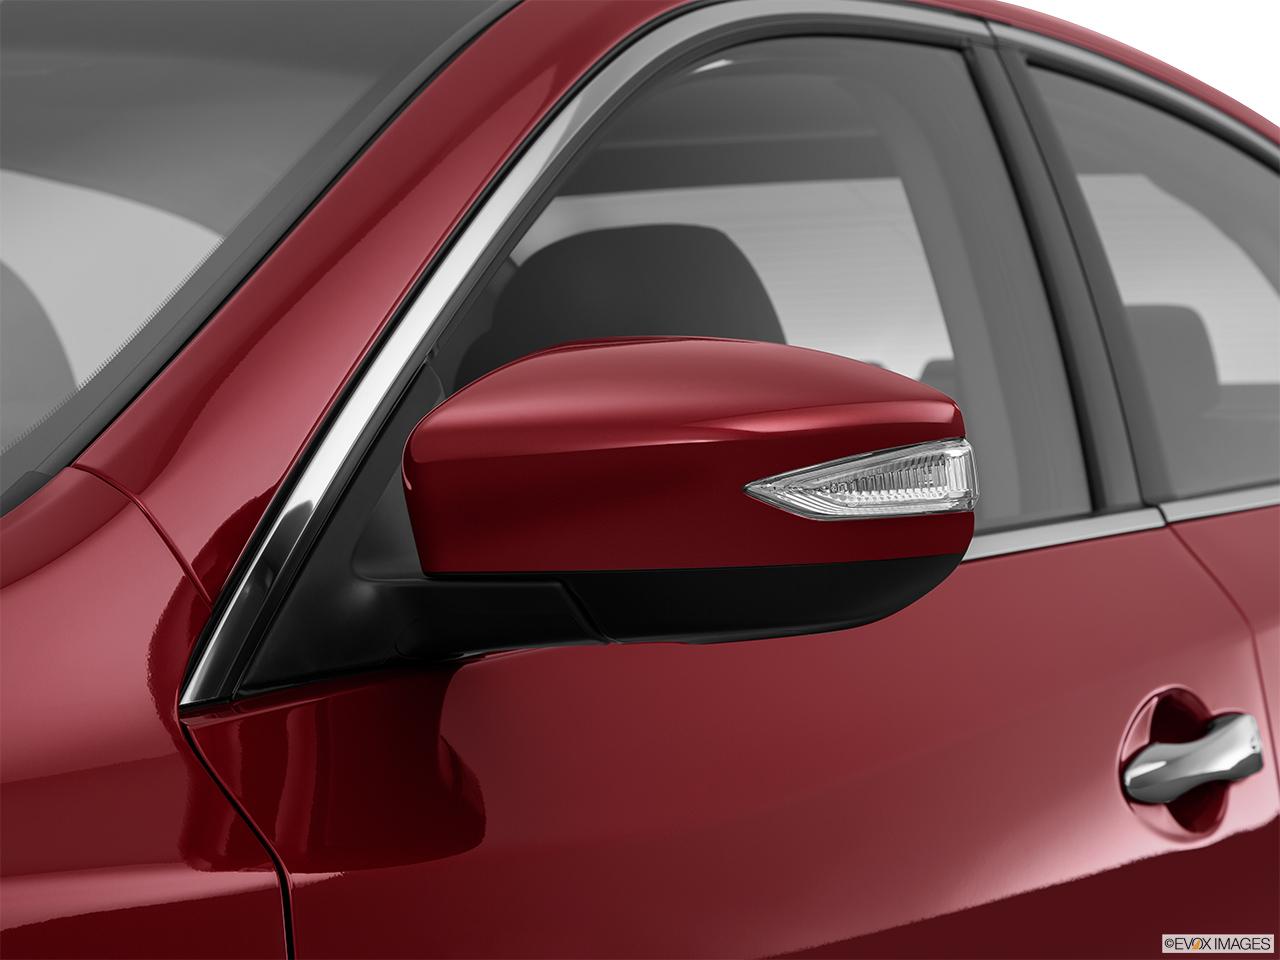 2015 Nissan Altima I4 2 5 Sl Sedan Front Angle View 2015 Nissan